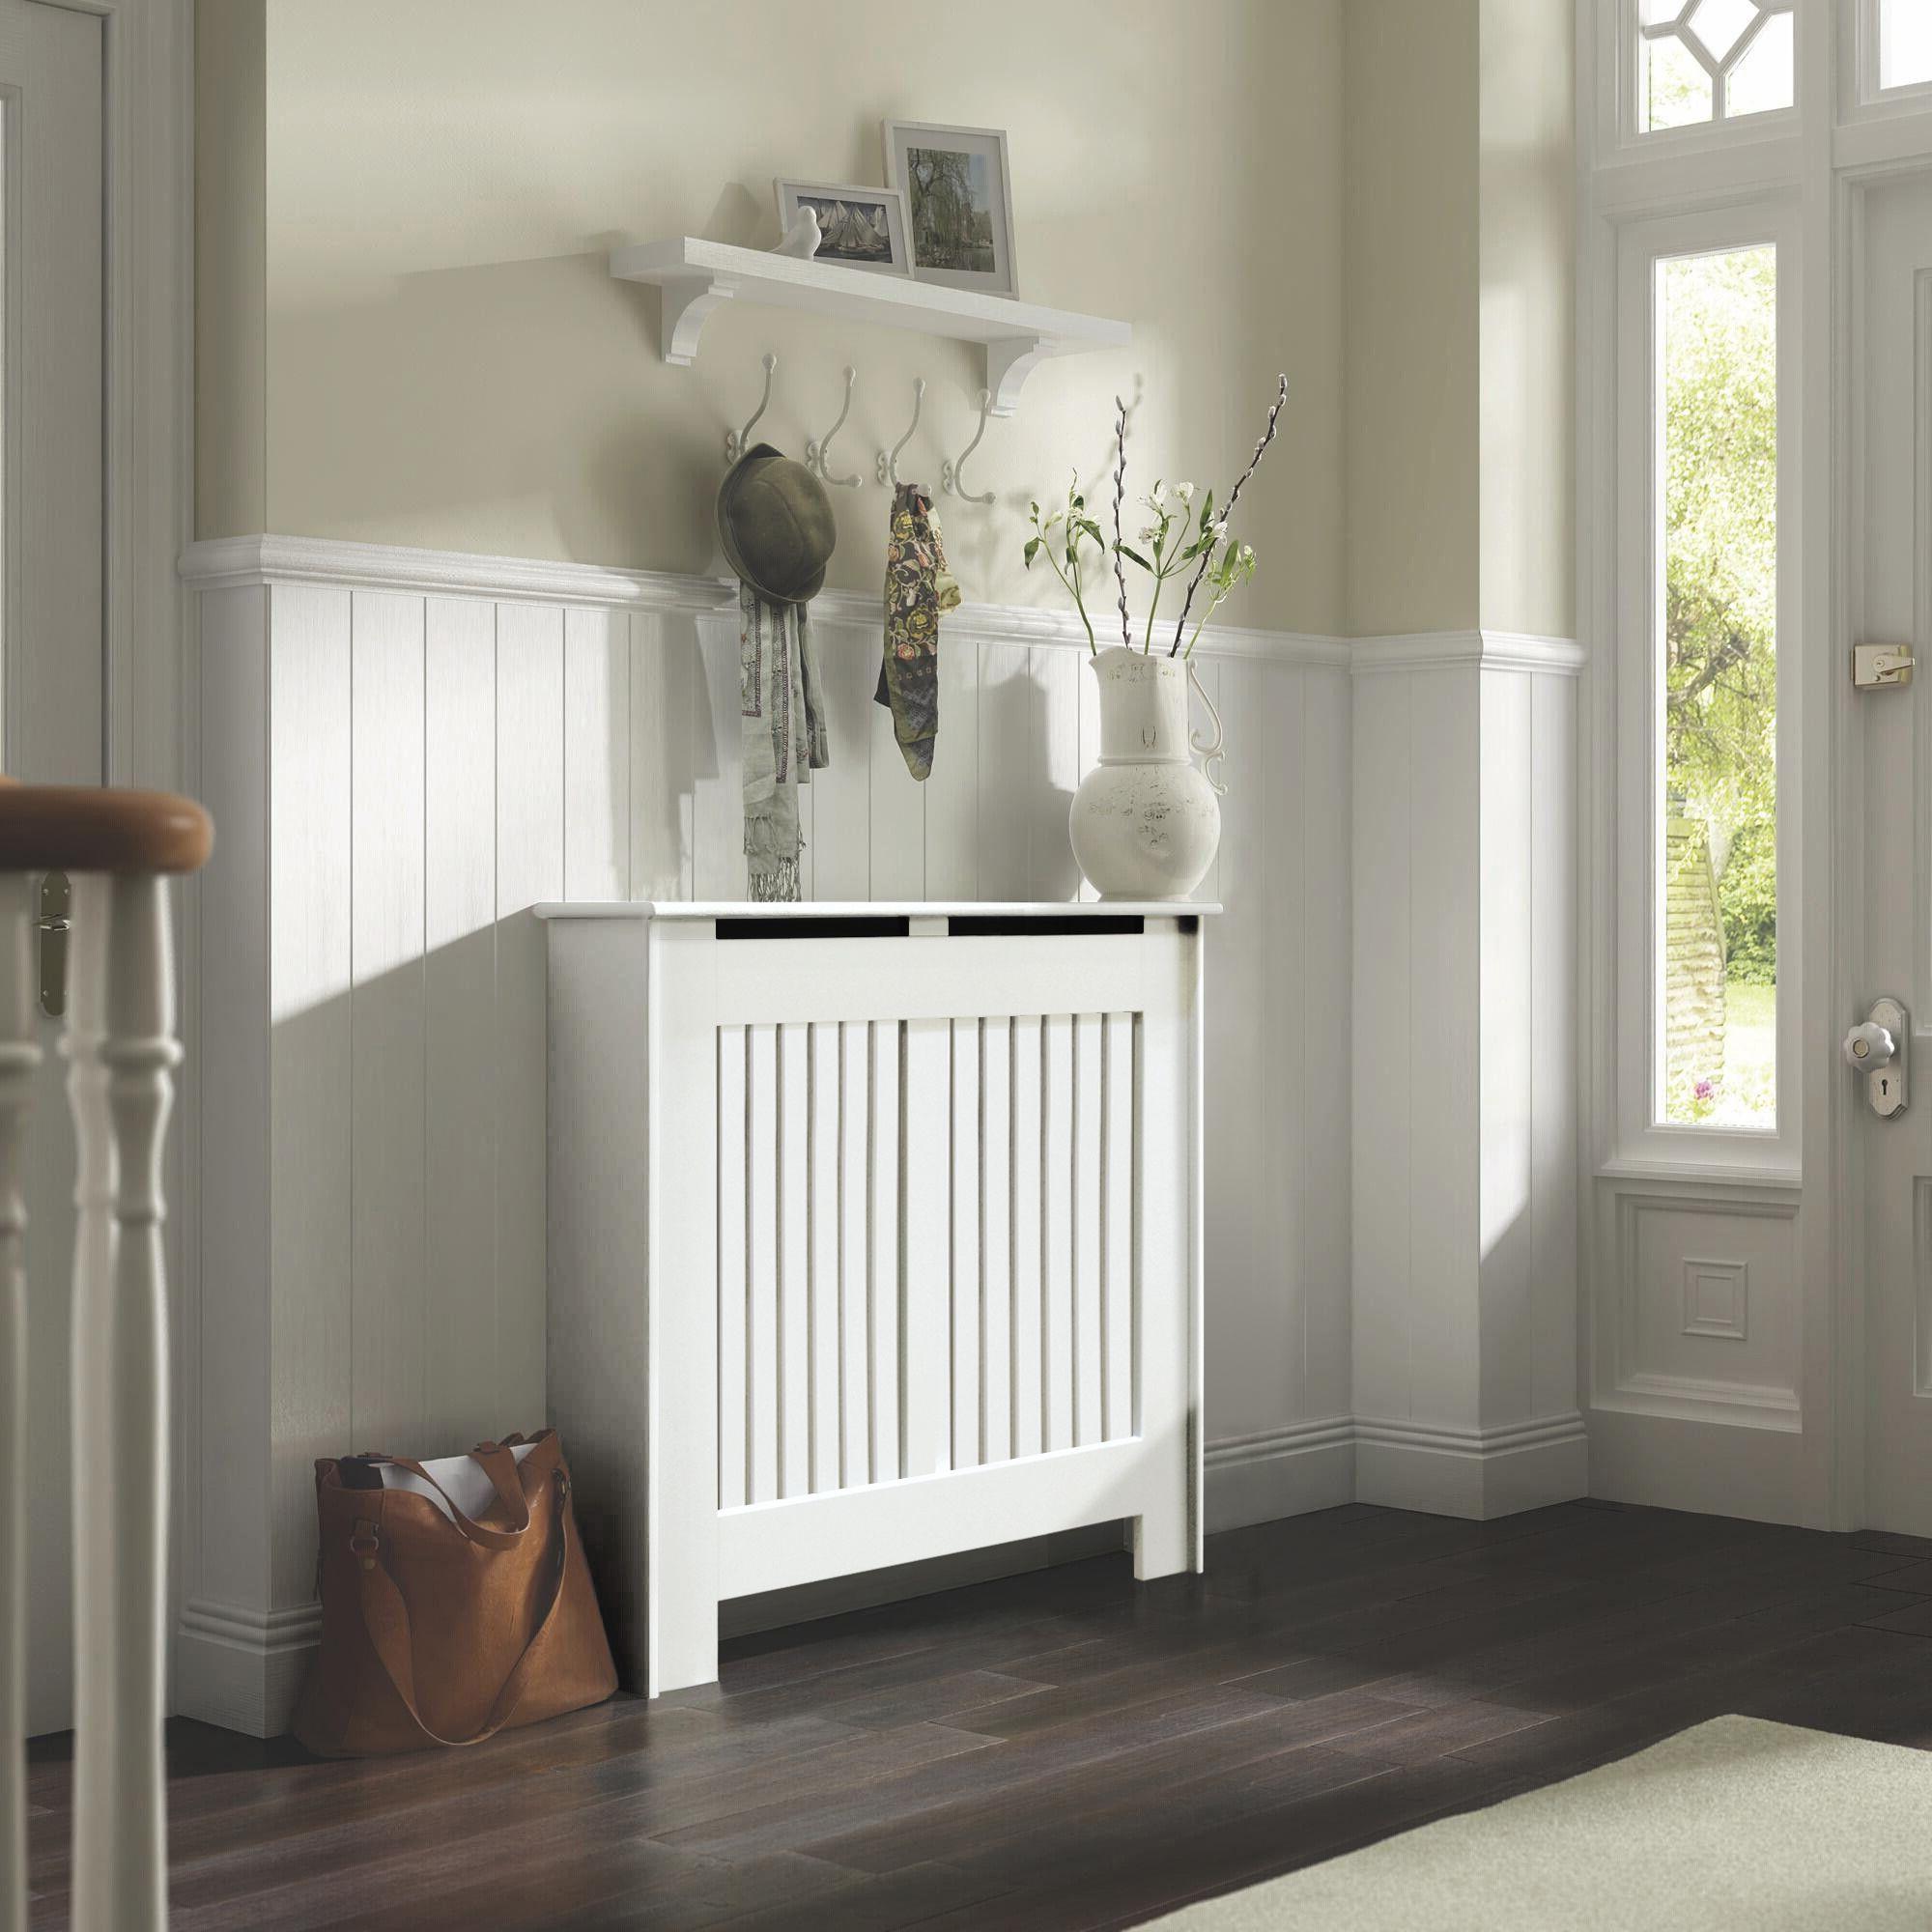 Heizungsverkleidung Selber Machen kensington small white painted radiator cover